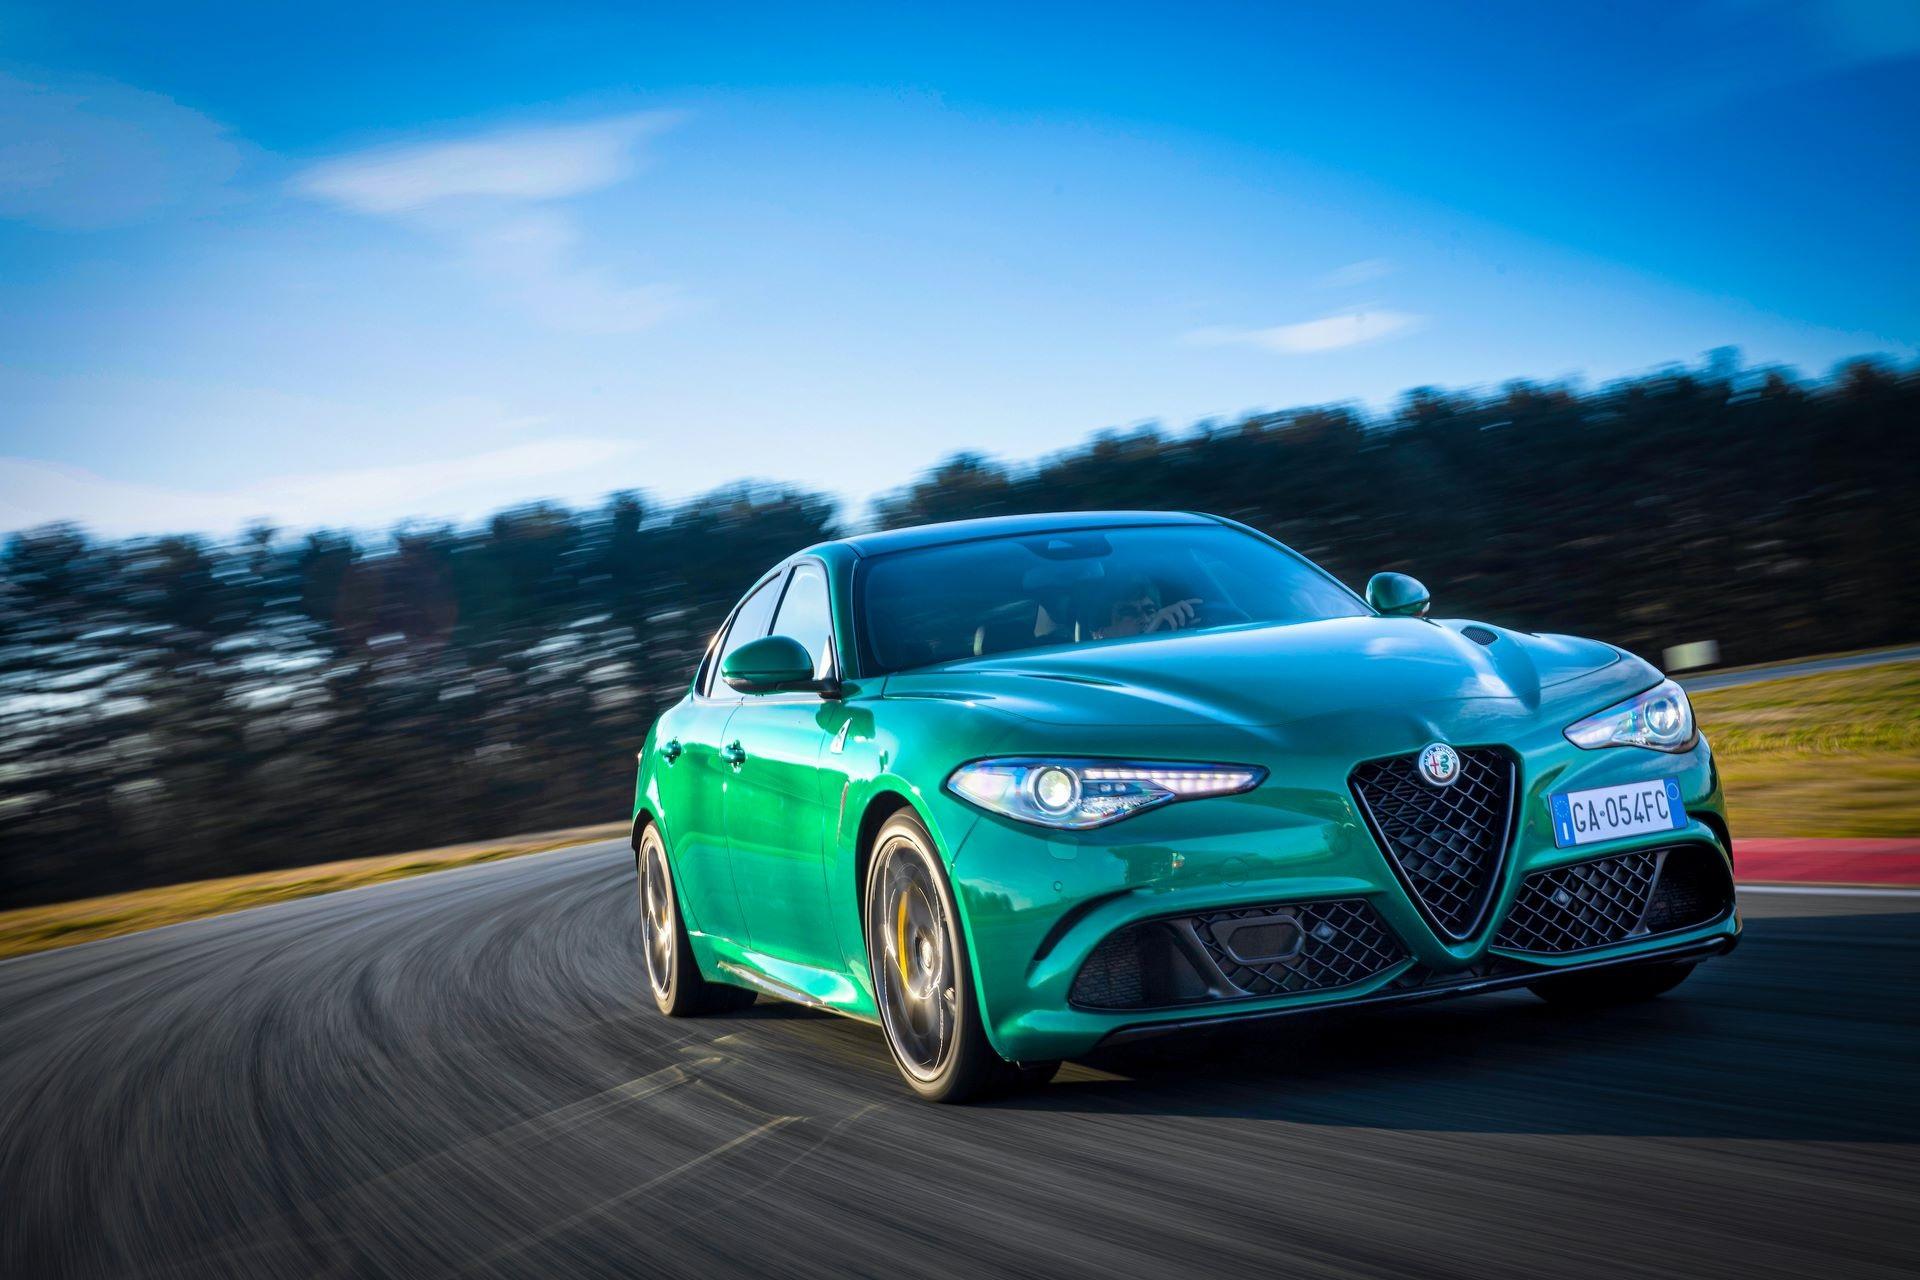 Alfa-Romeo-Giulia-Quadrifoglio-Stelvio-Quadrifoglio-facelift-2020-2